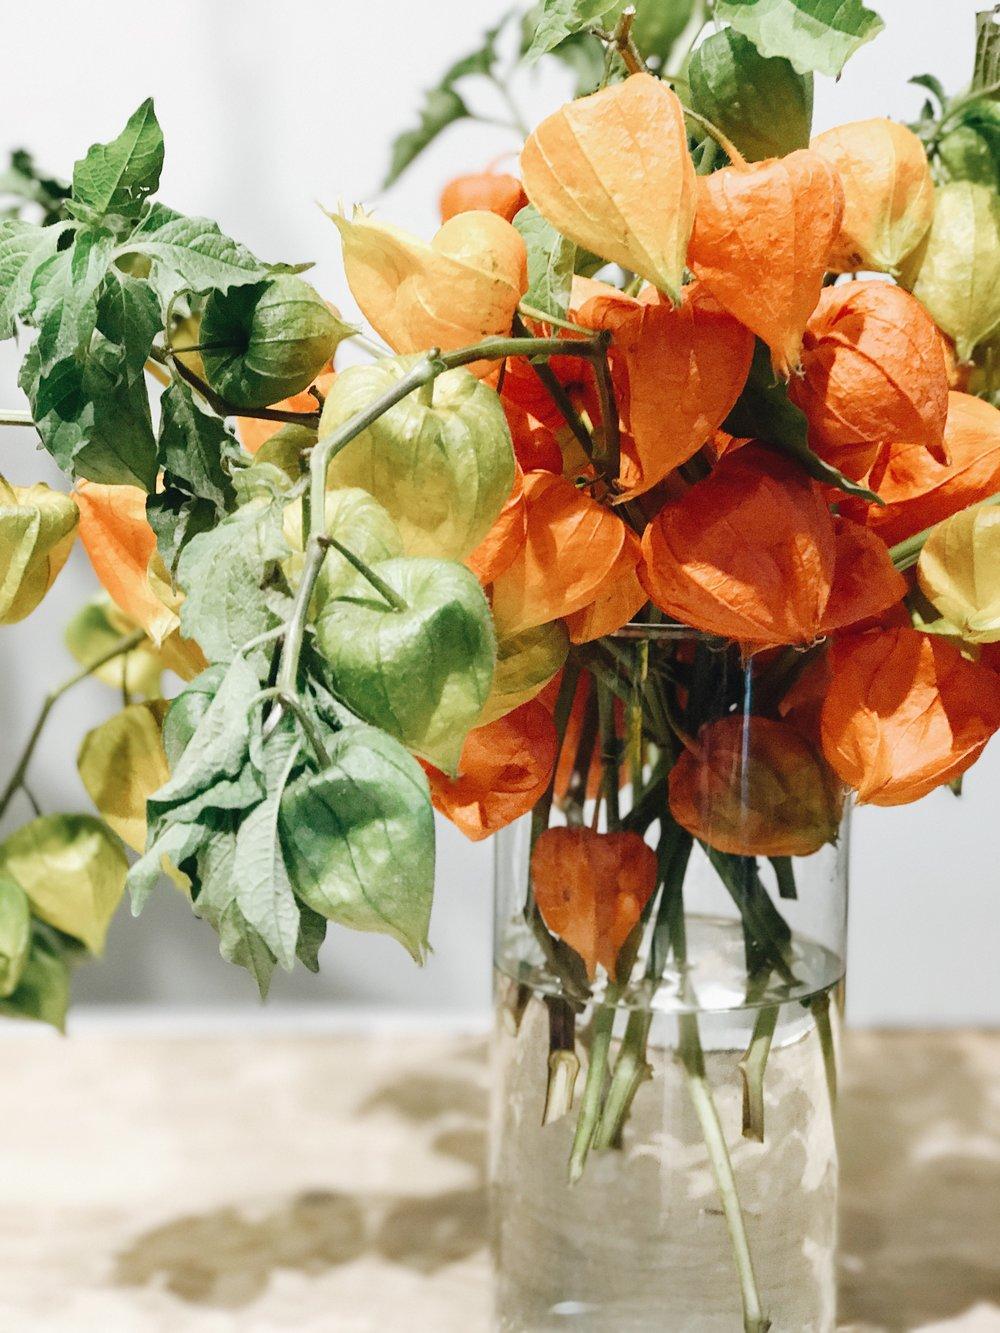 Fall Flowers 101, Chinese Lanterns, Nyla Free Designs Inc.